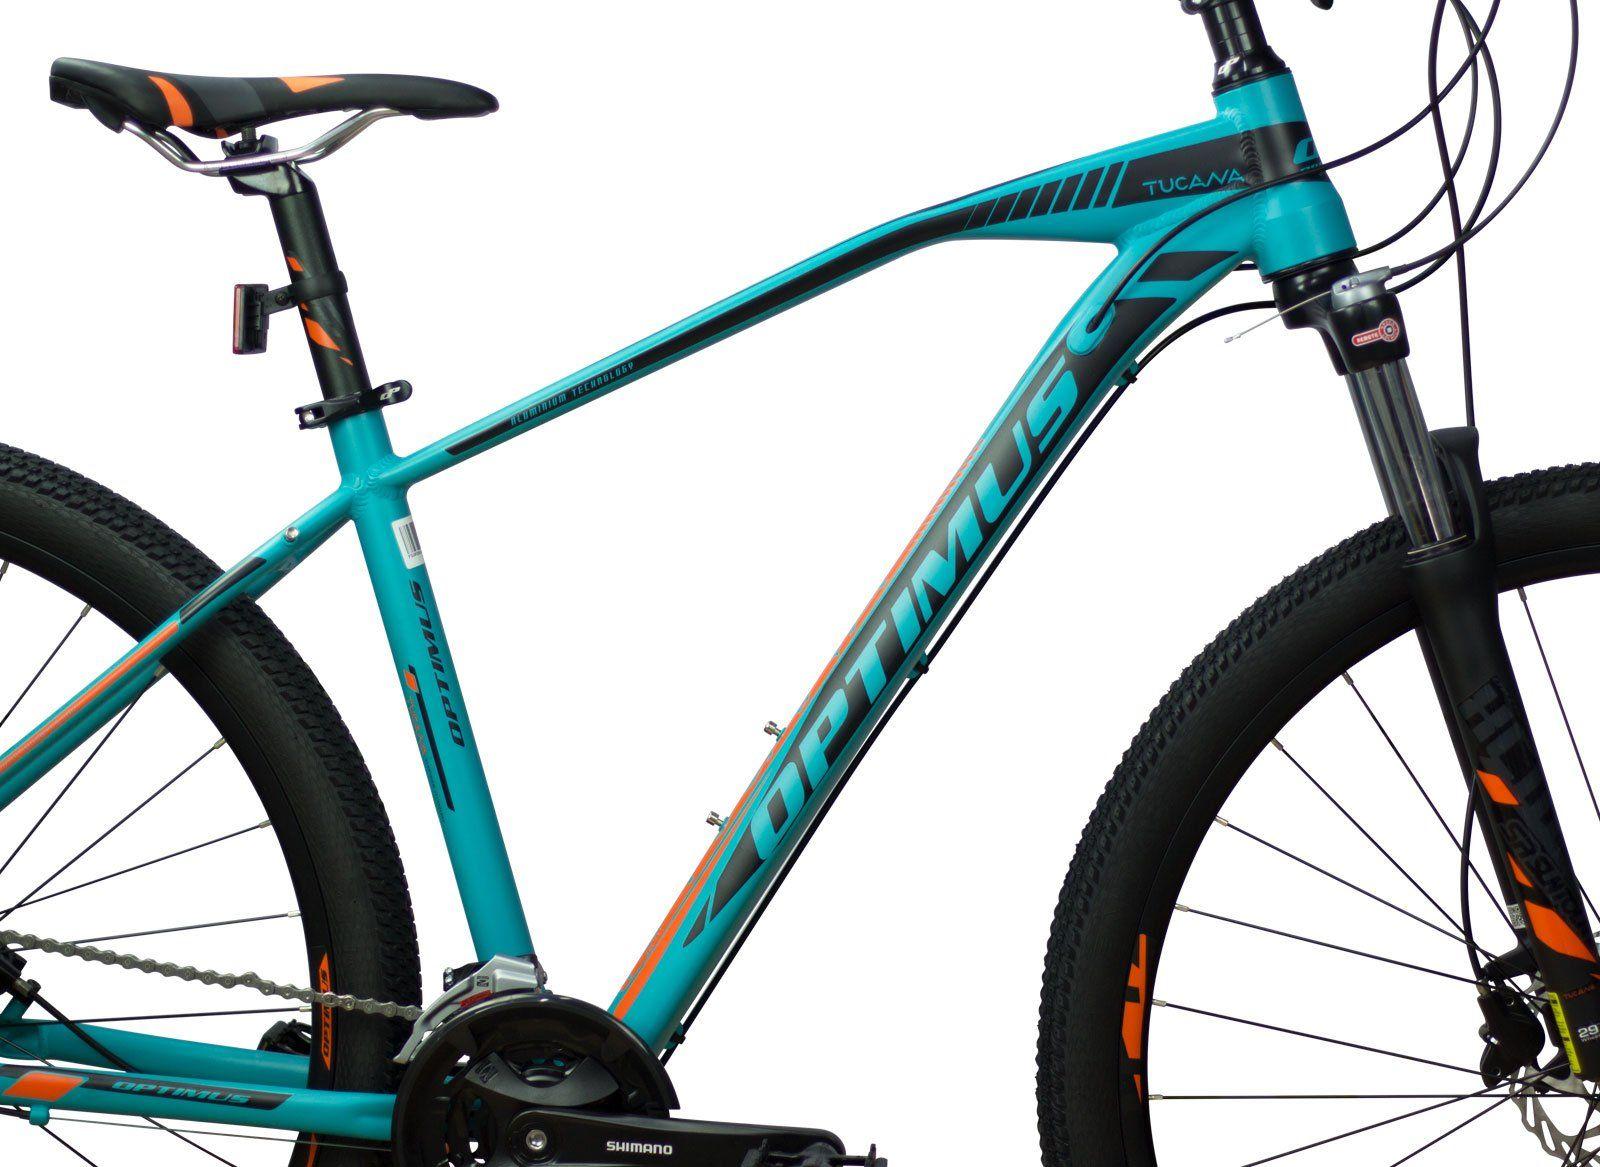 Bicicleta MTB Optimus TUCANA 29 V9 - Tam M - Verde/Preta 2021